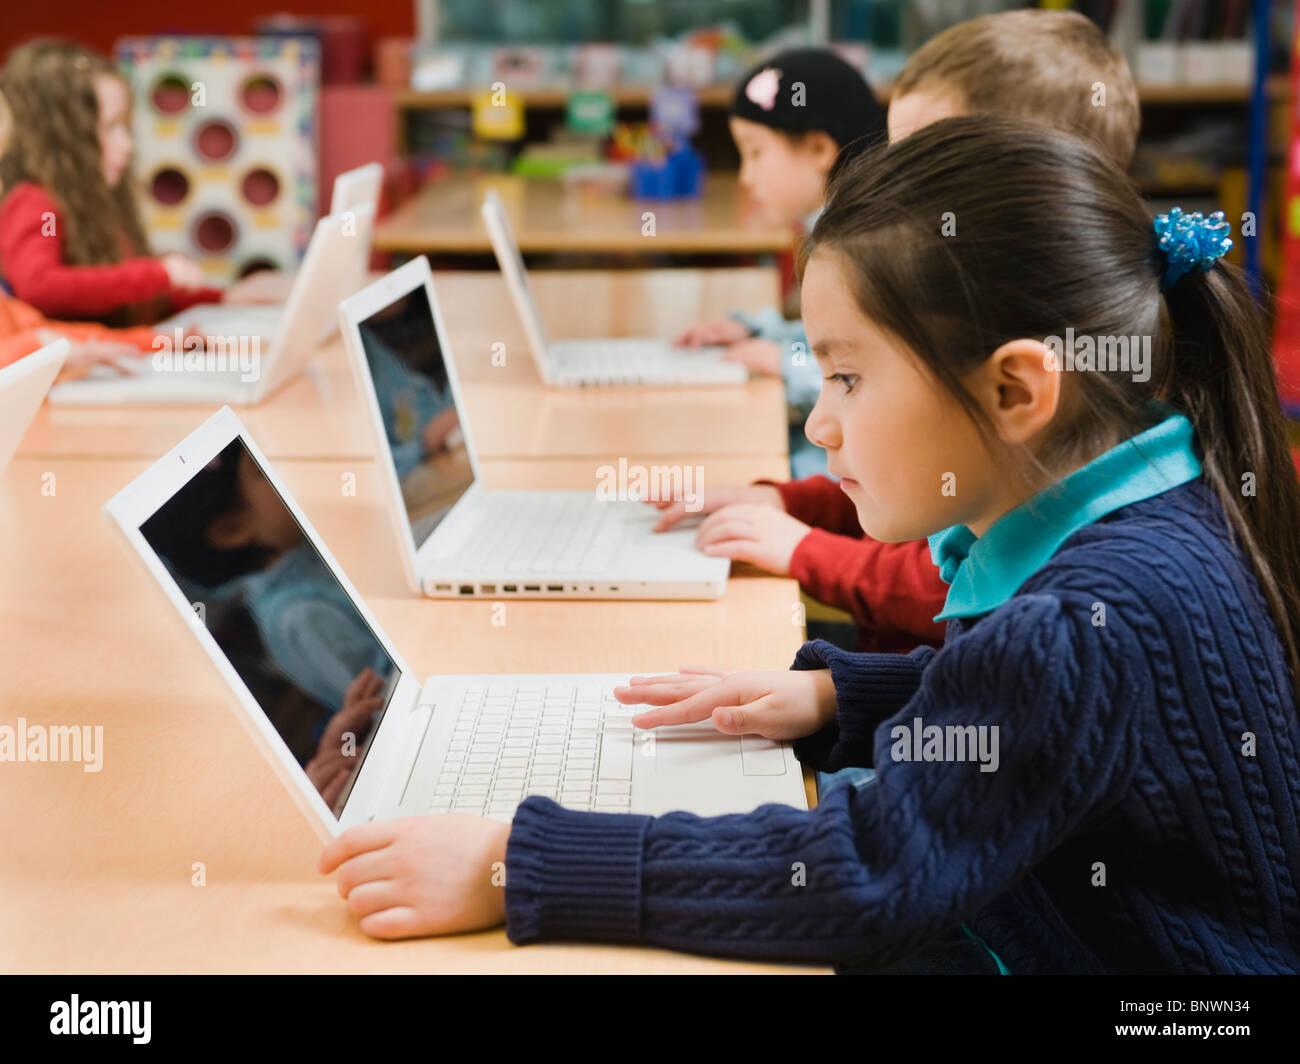 Kindergarten students working on laptops - Stock Image